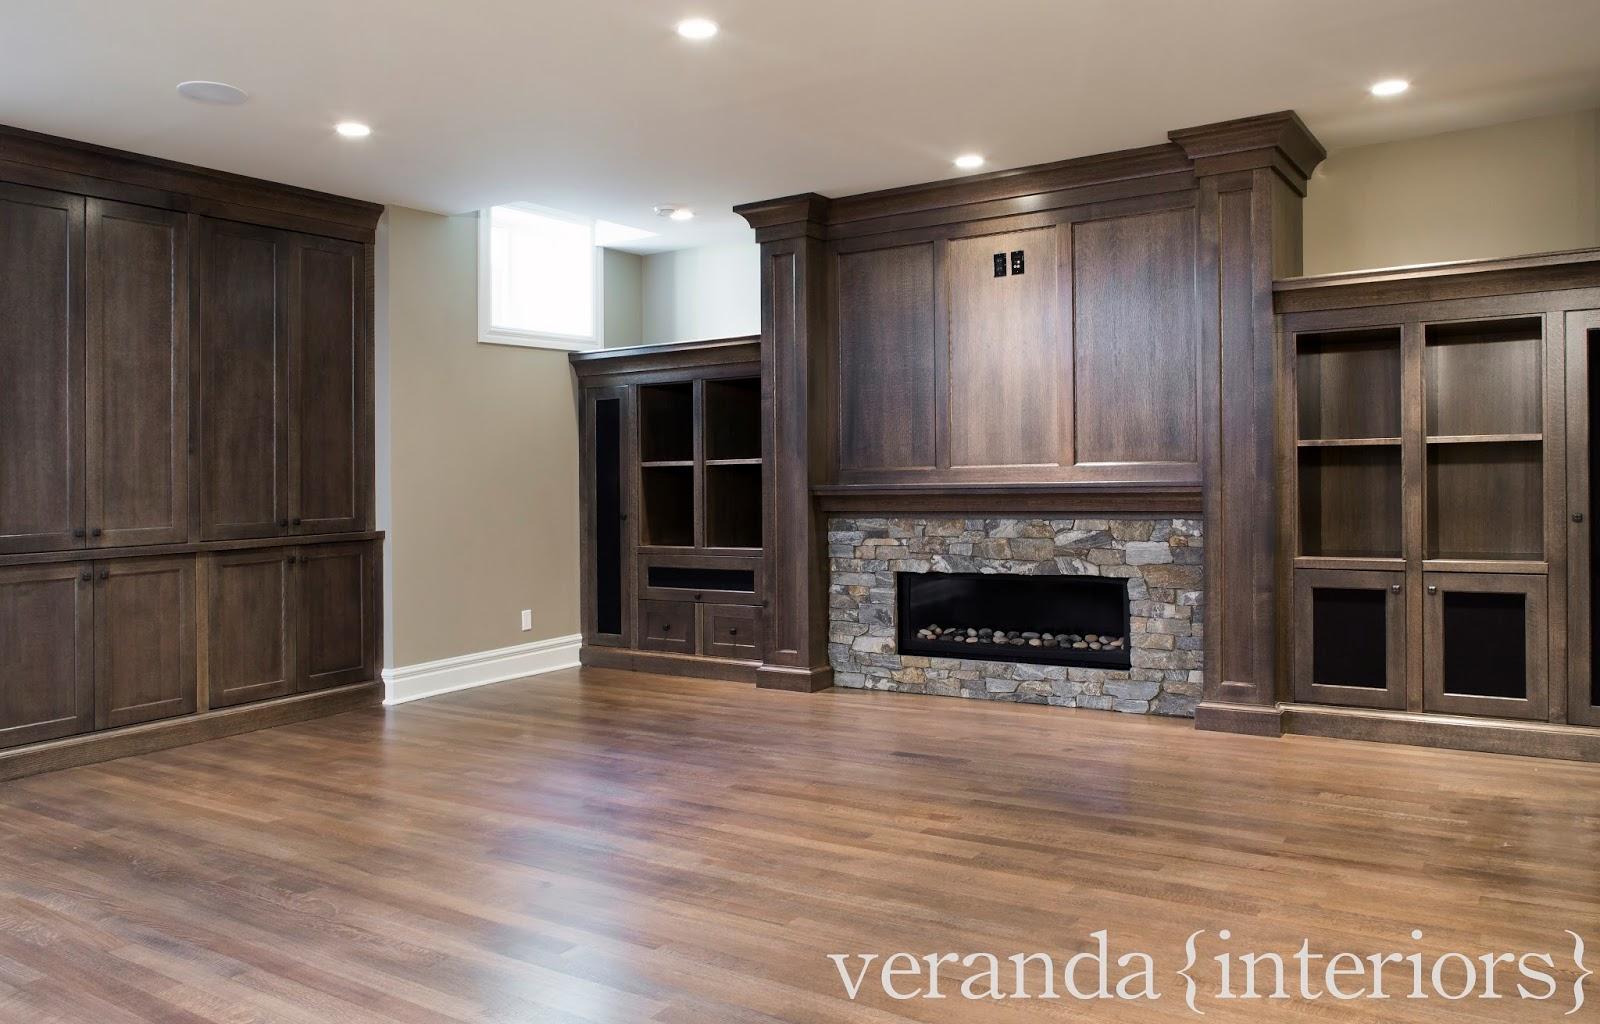 Veranda Interior   Interior Improvement Tips, News, and Product Reviews